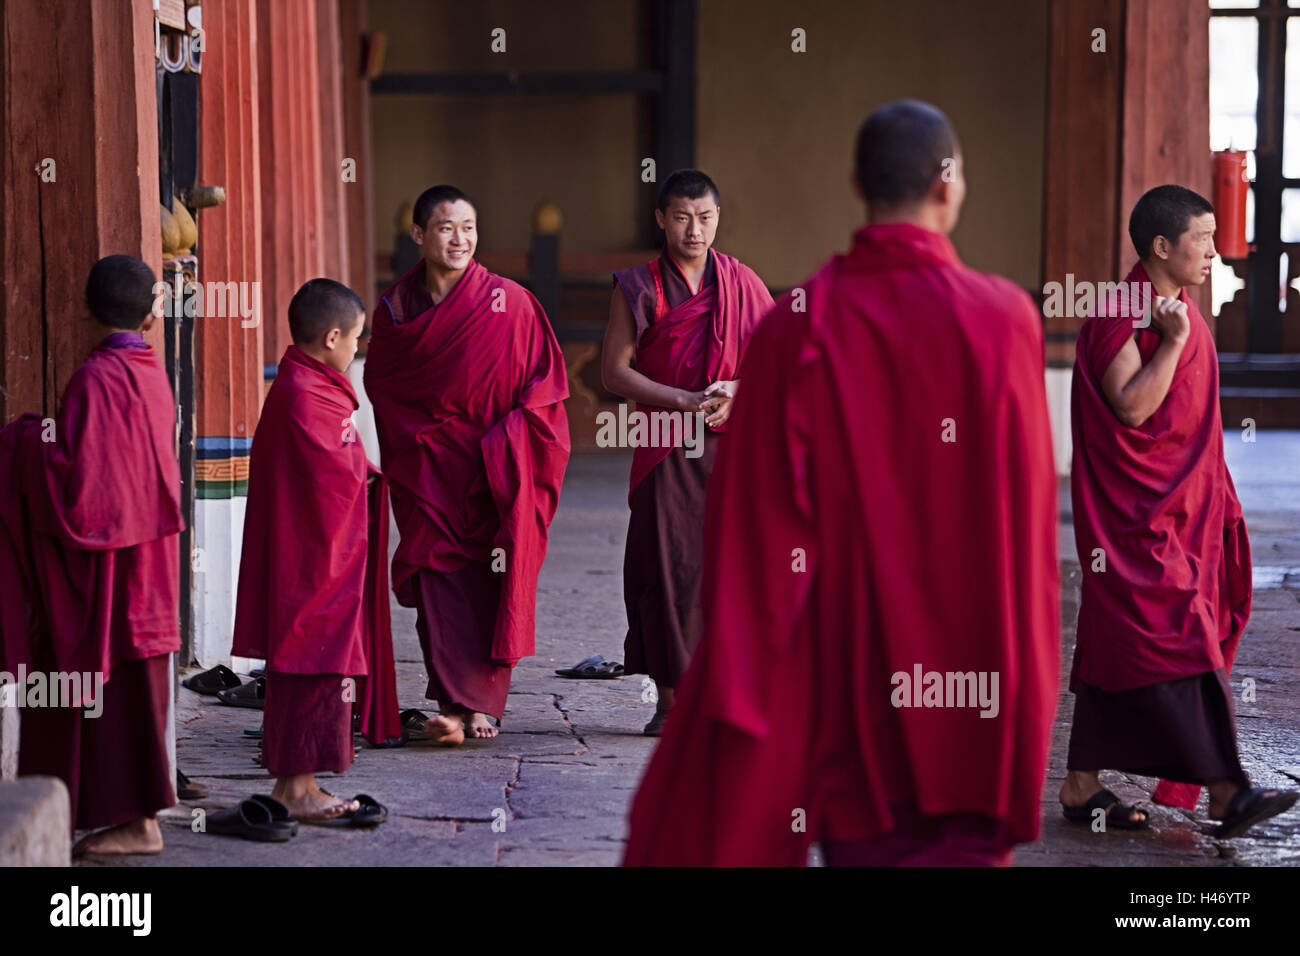 Kingdom Bhutan, monks in the Paro Dzong, Stock Photo